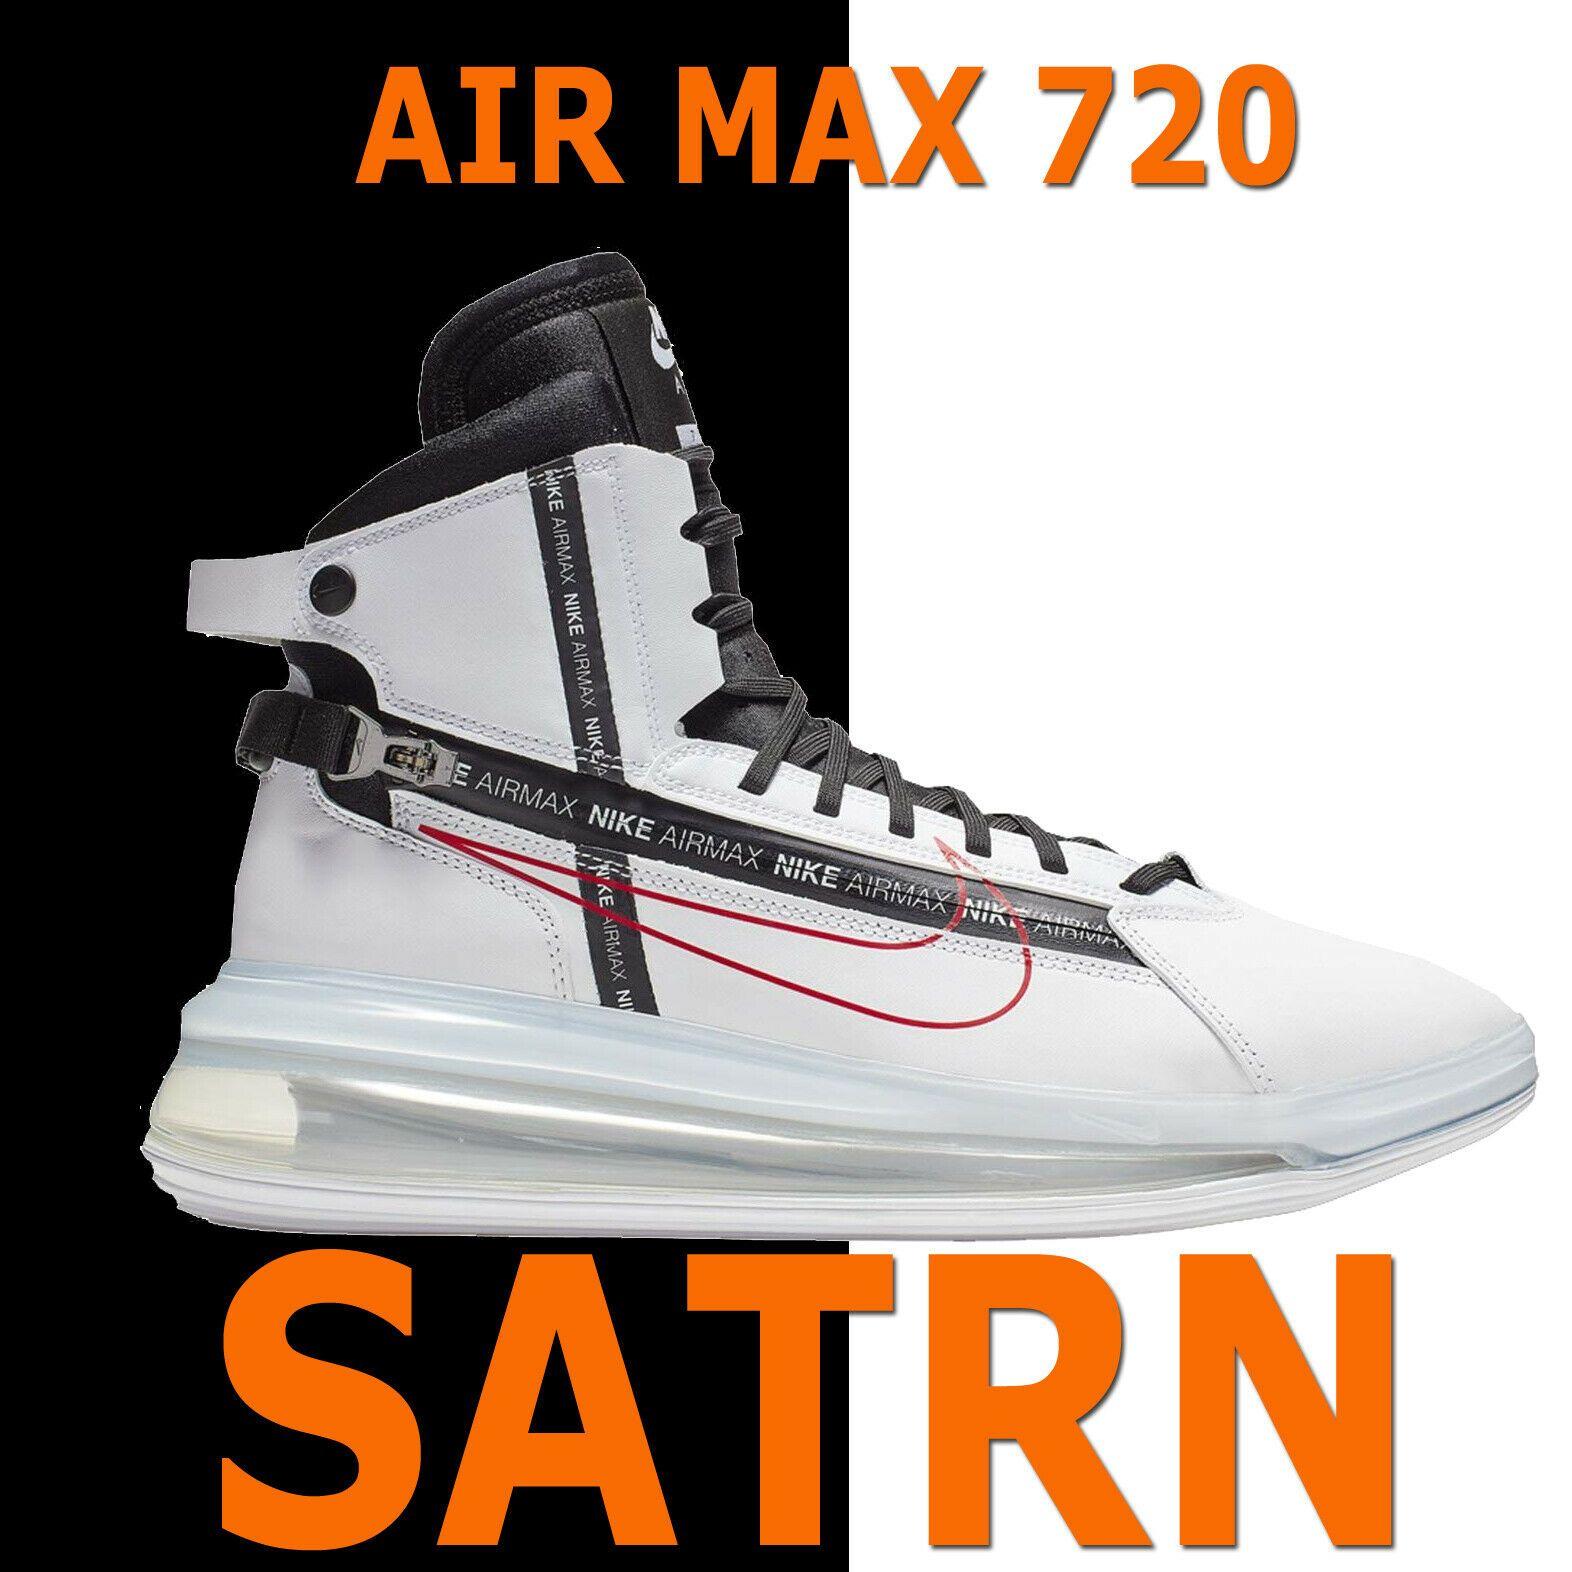 Nike Air Max 720 Saturn White Red Men S Future Shoes Satrn